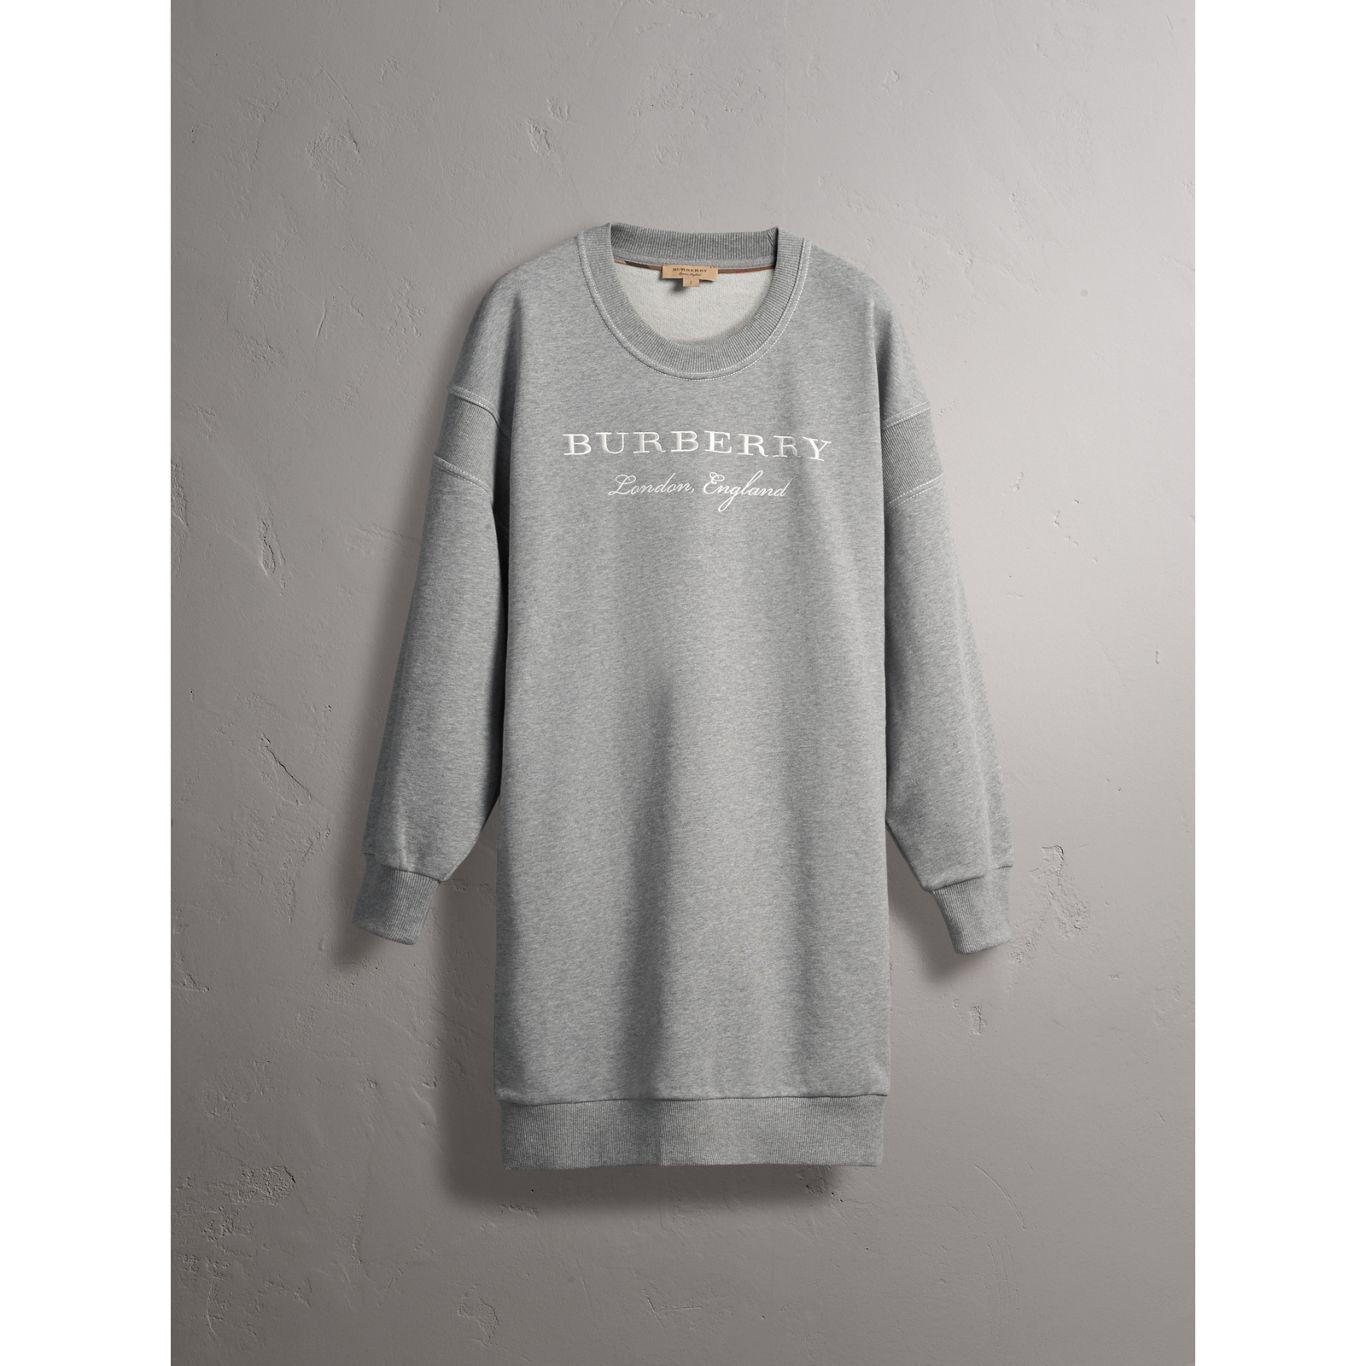 a4c06557914e4 Burberry Robe sweat shirt en jersey de coton avec motif brode